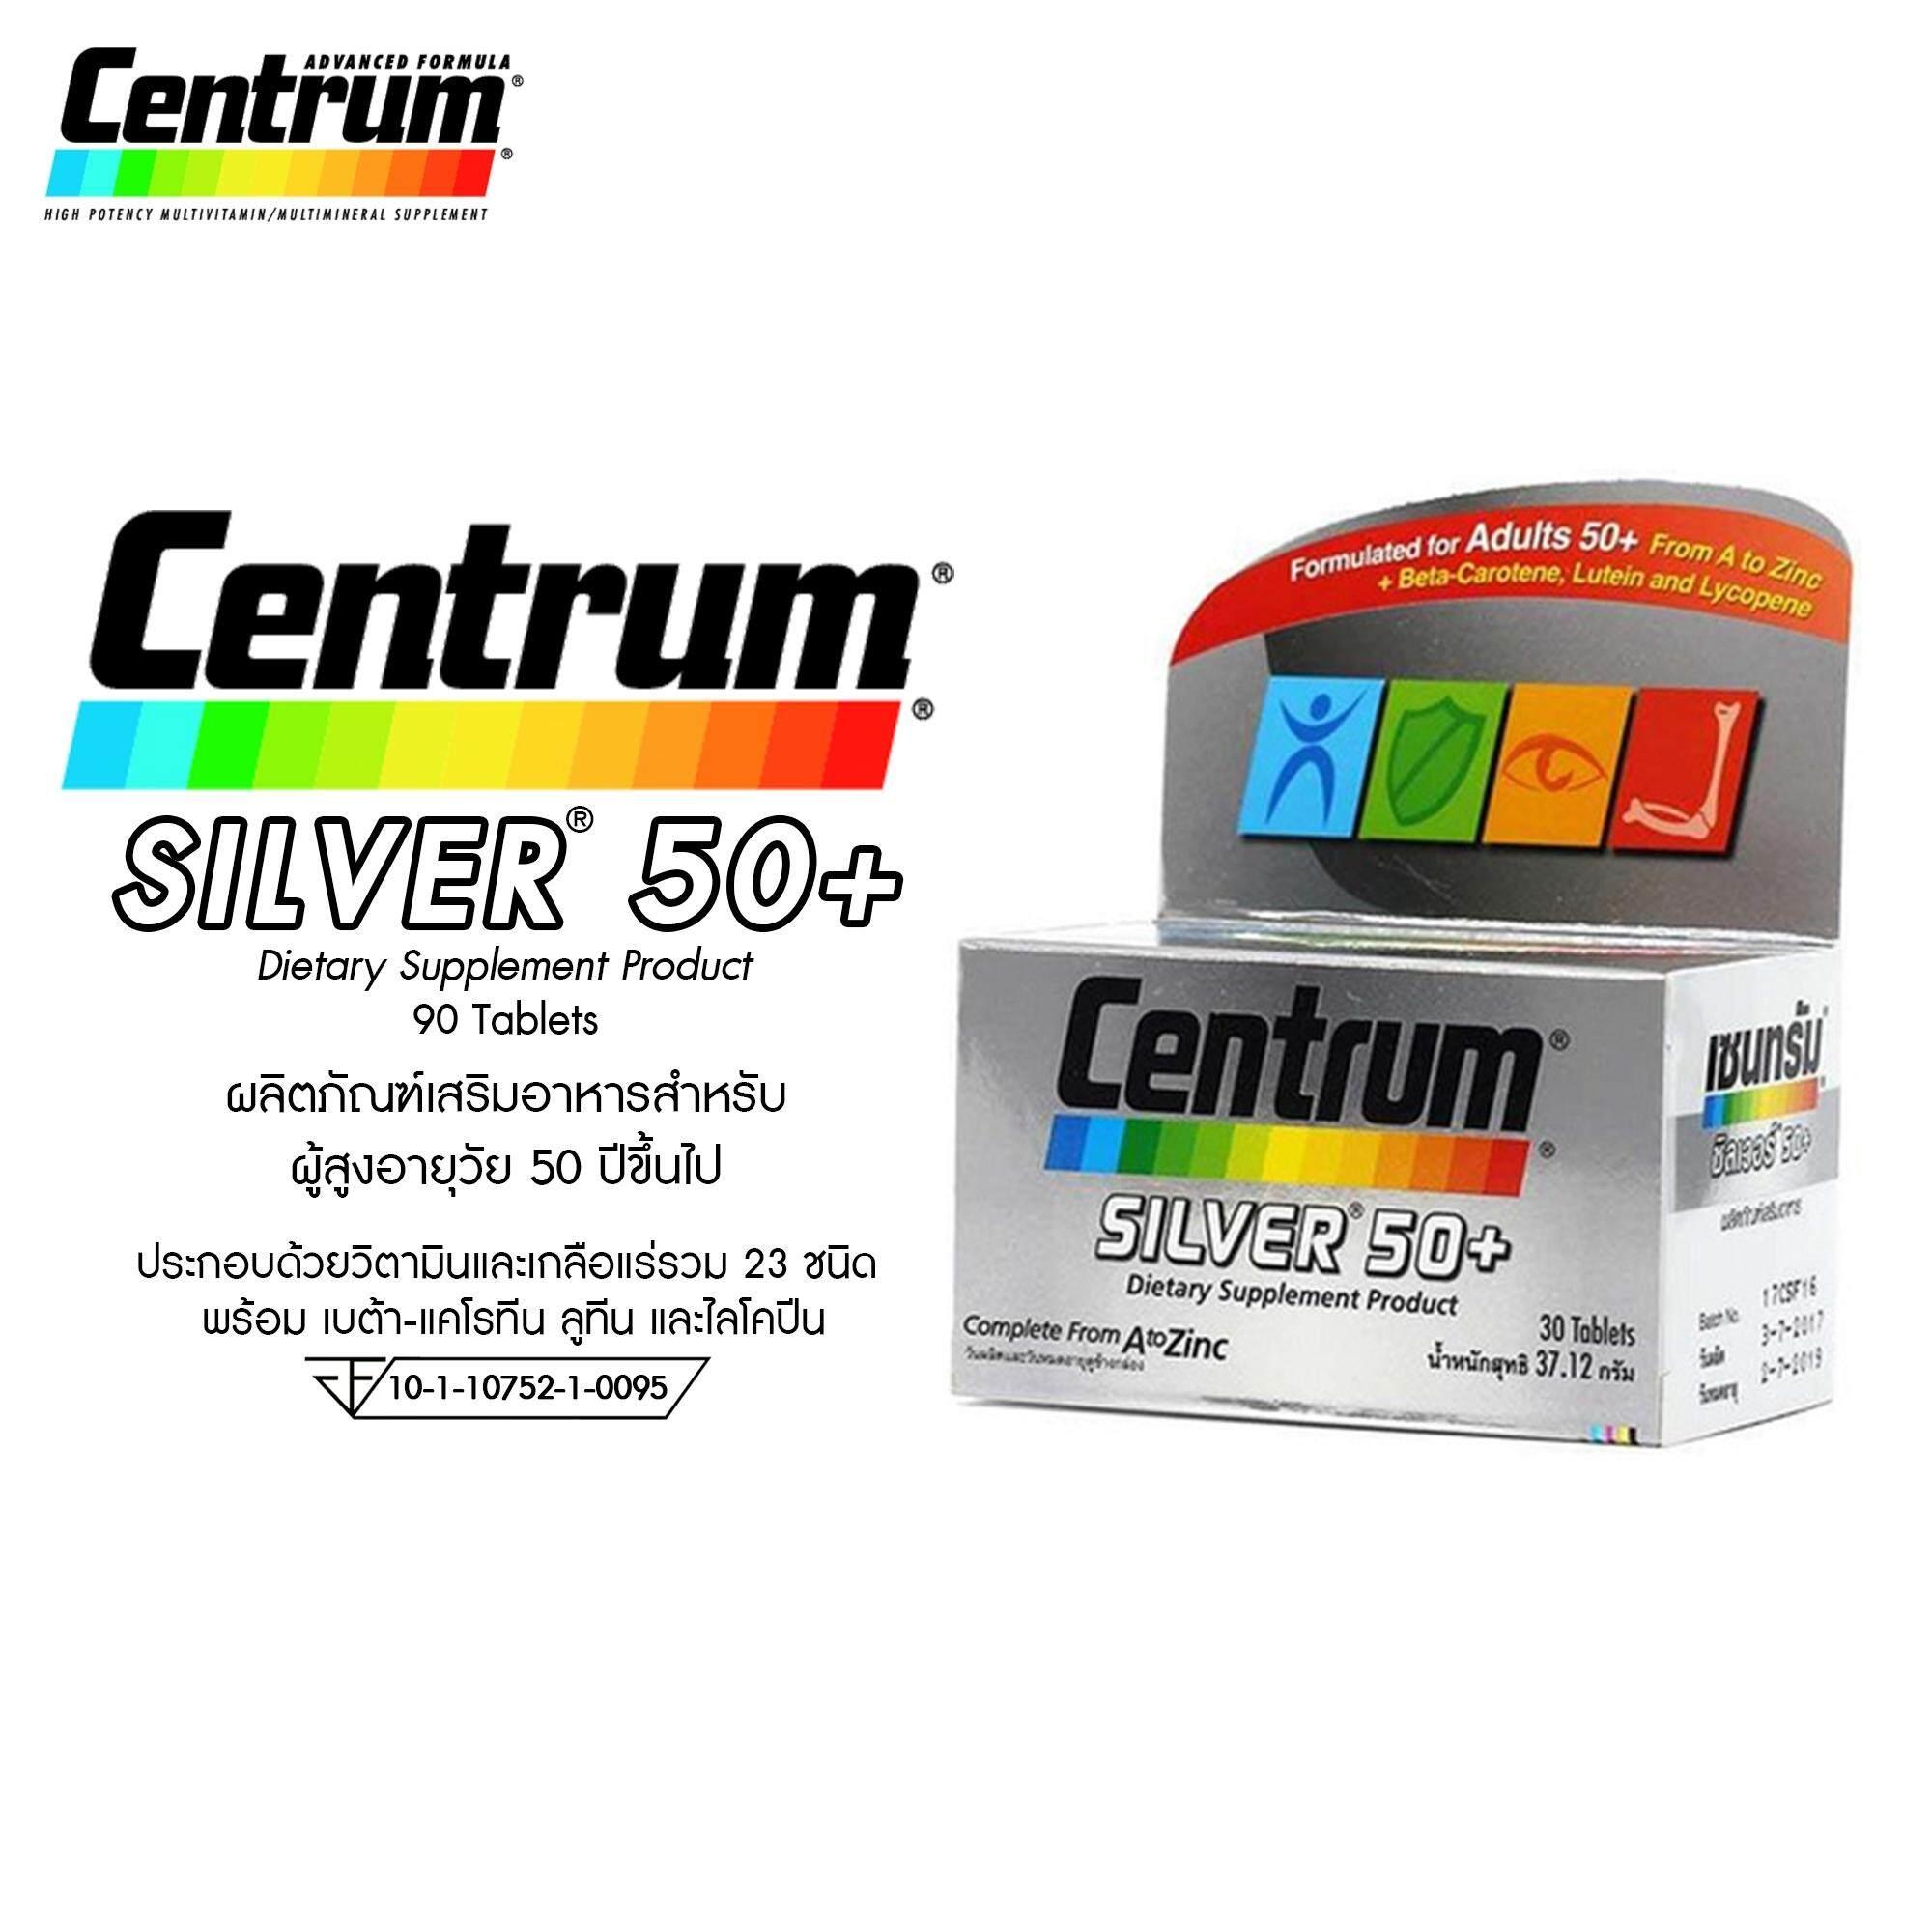 Centrum Silver 50+  90 Tablets